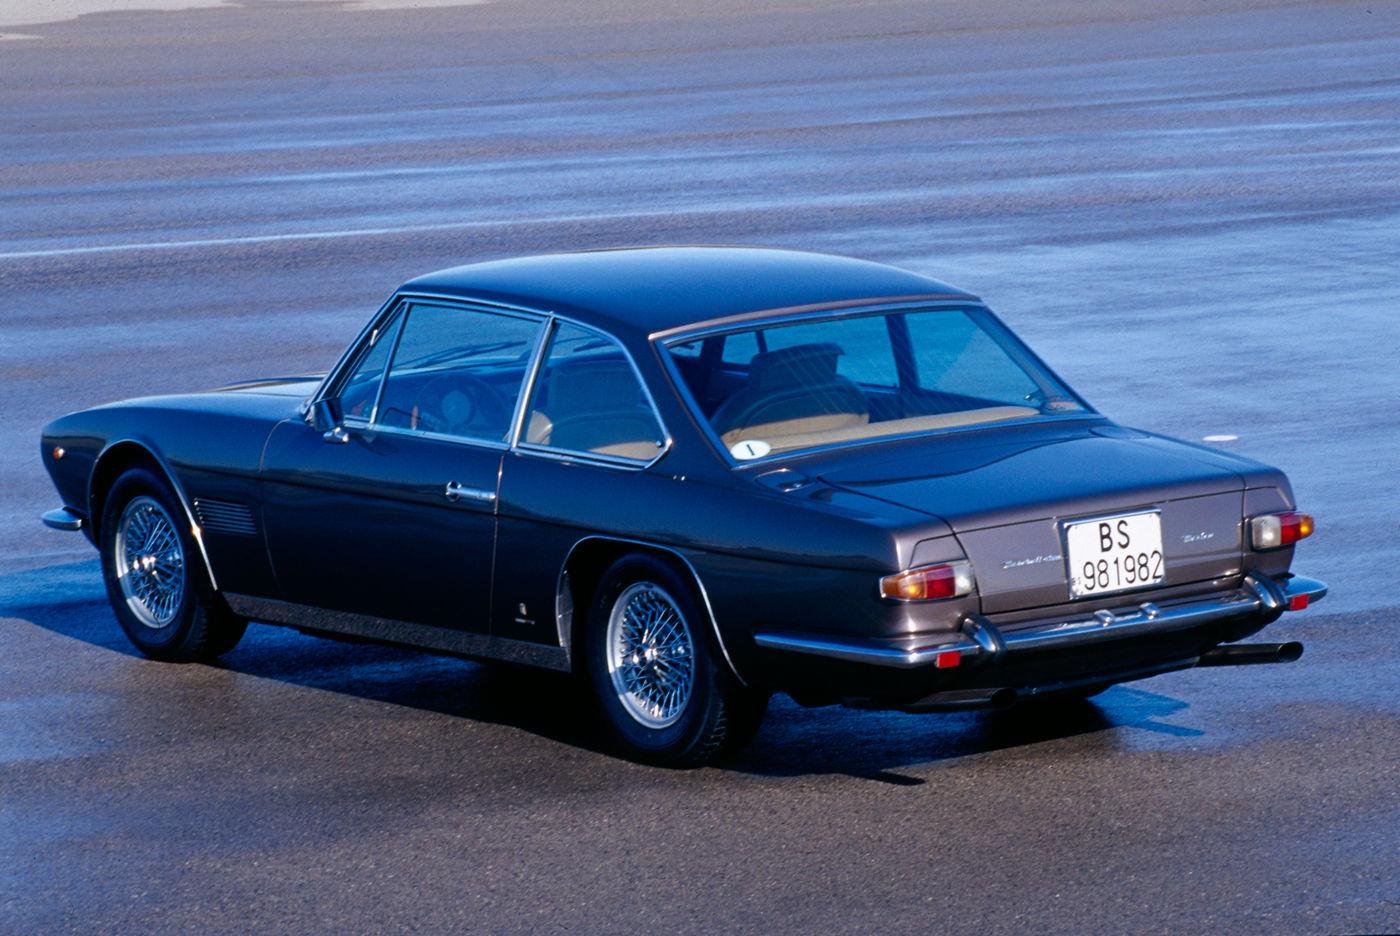 Maserati Classic - GranTurismo Mexico - carrosserie marron - vue latérale postérieure